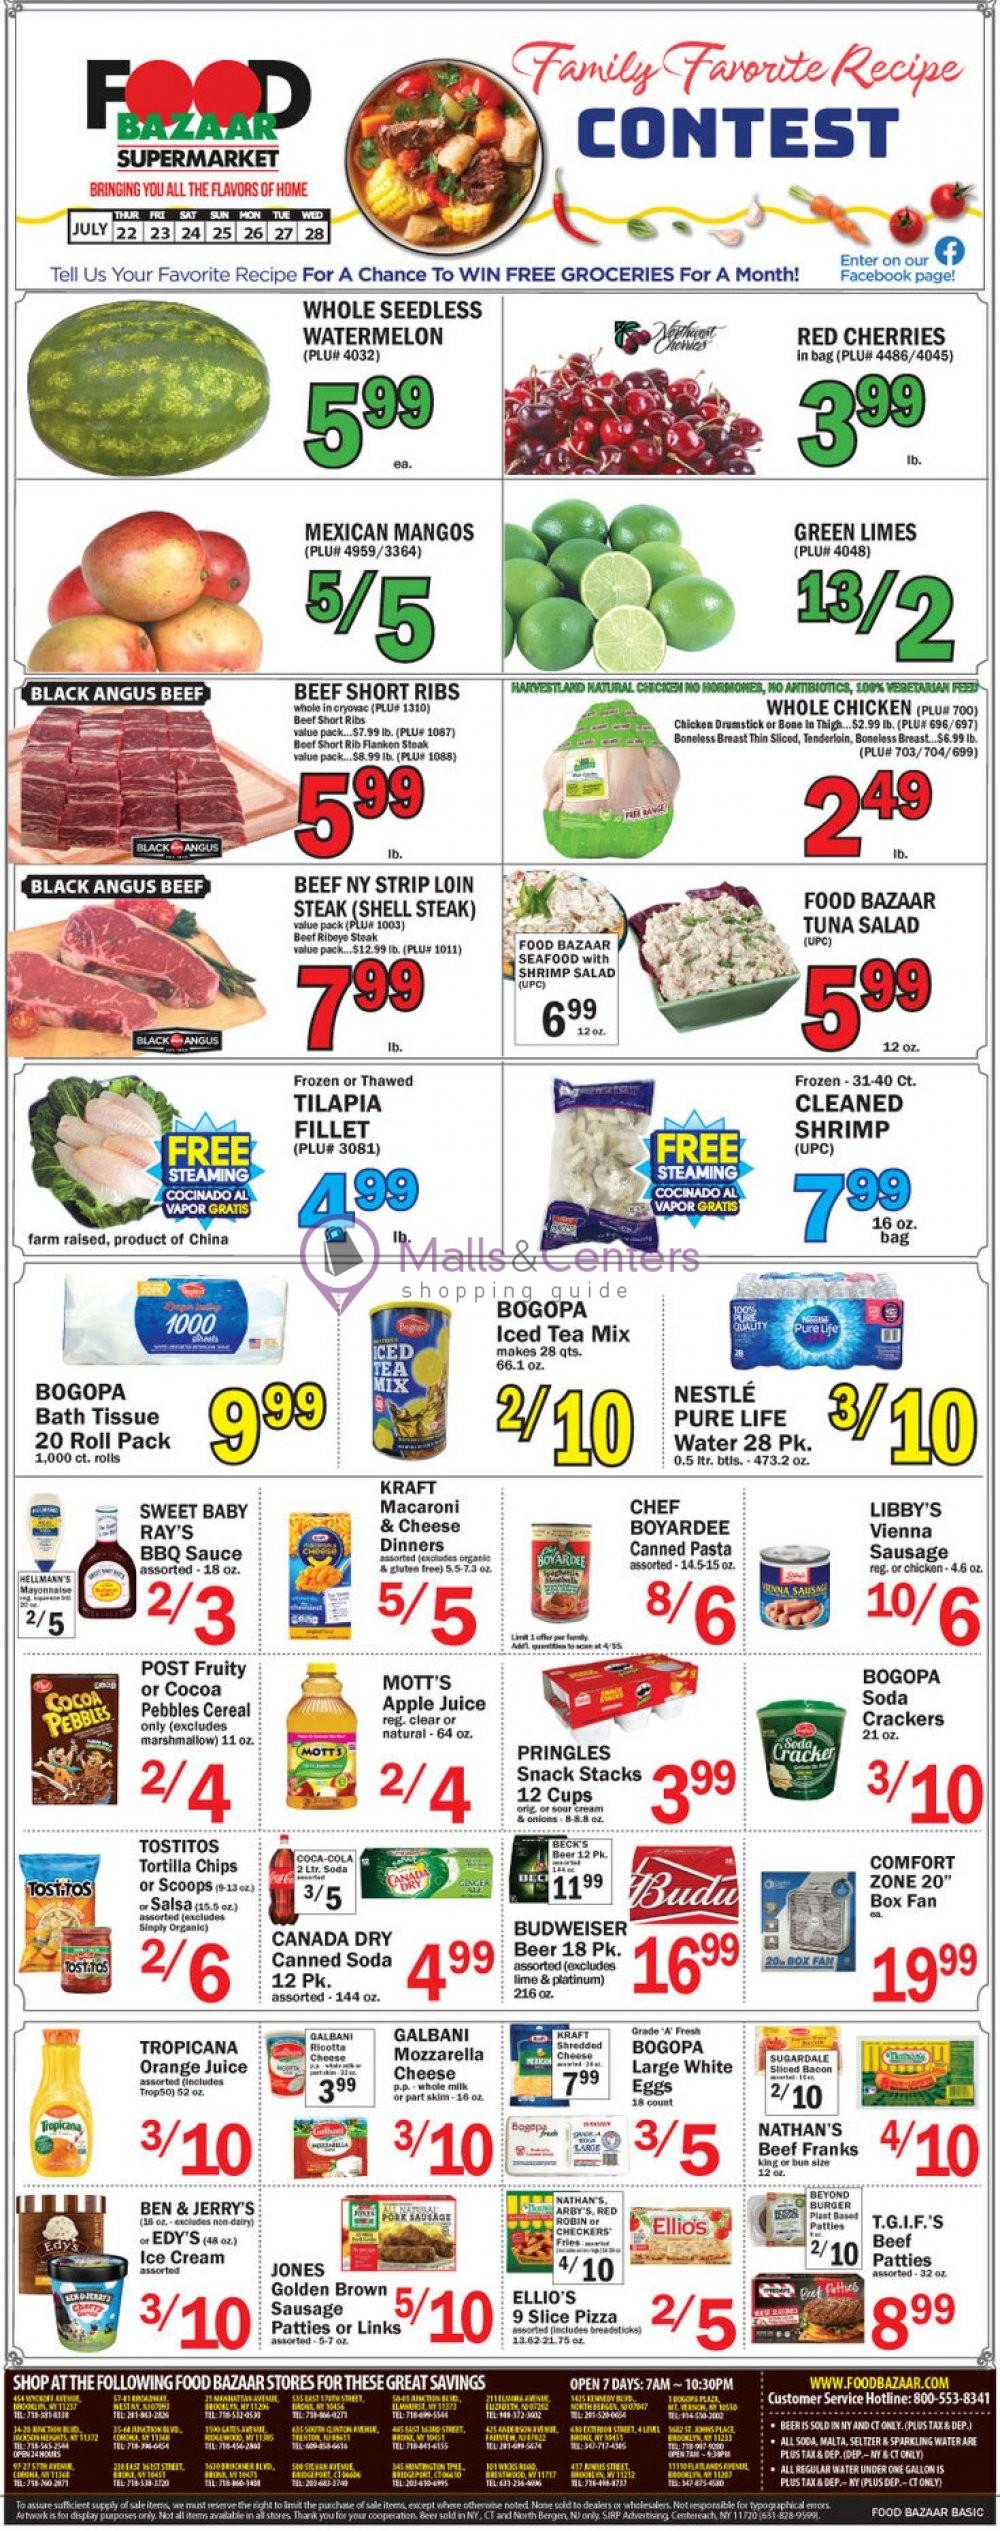 weekly ads Food Bazaar - page 1 - mallscenters.com